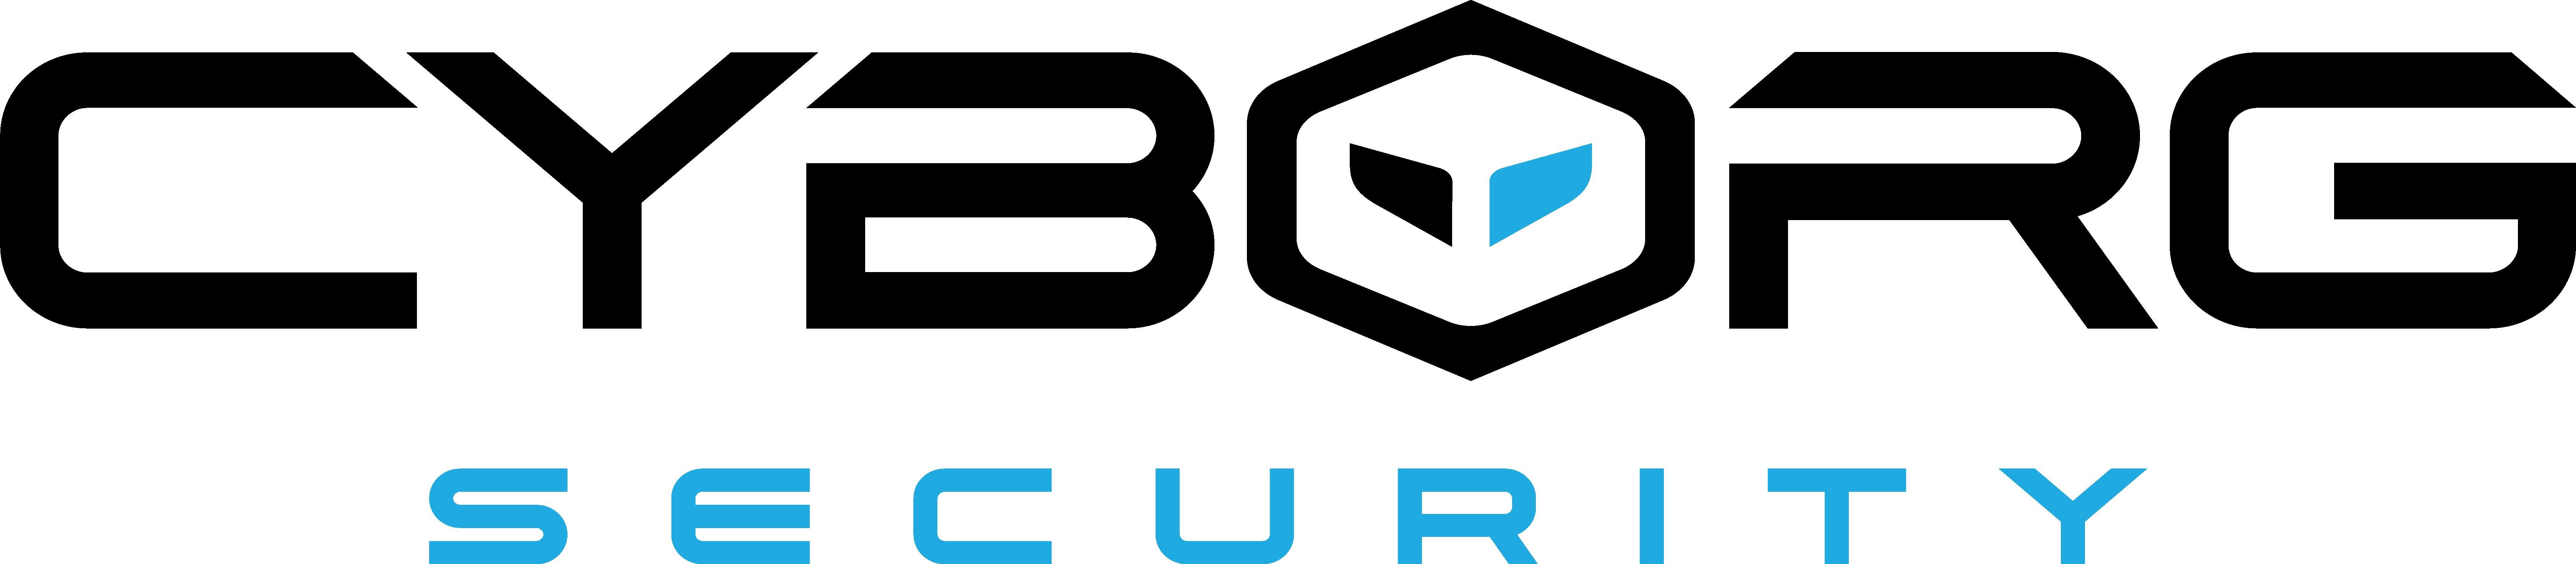 Cyborg-Logo-Full-Color-CMYK_(1).png